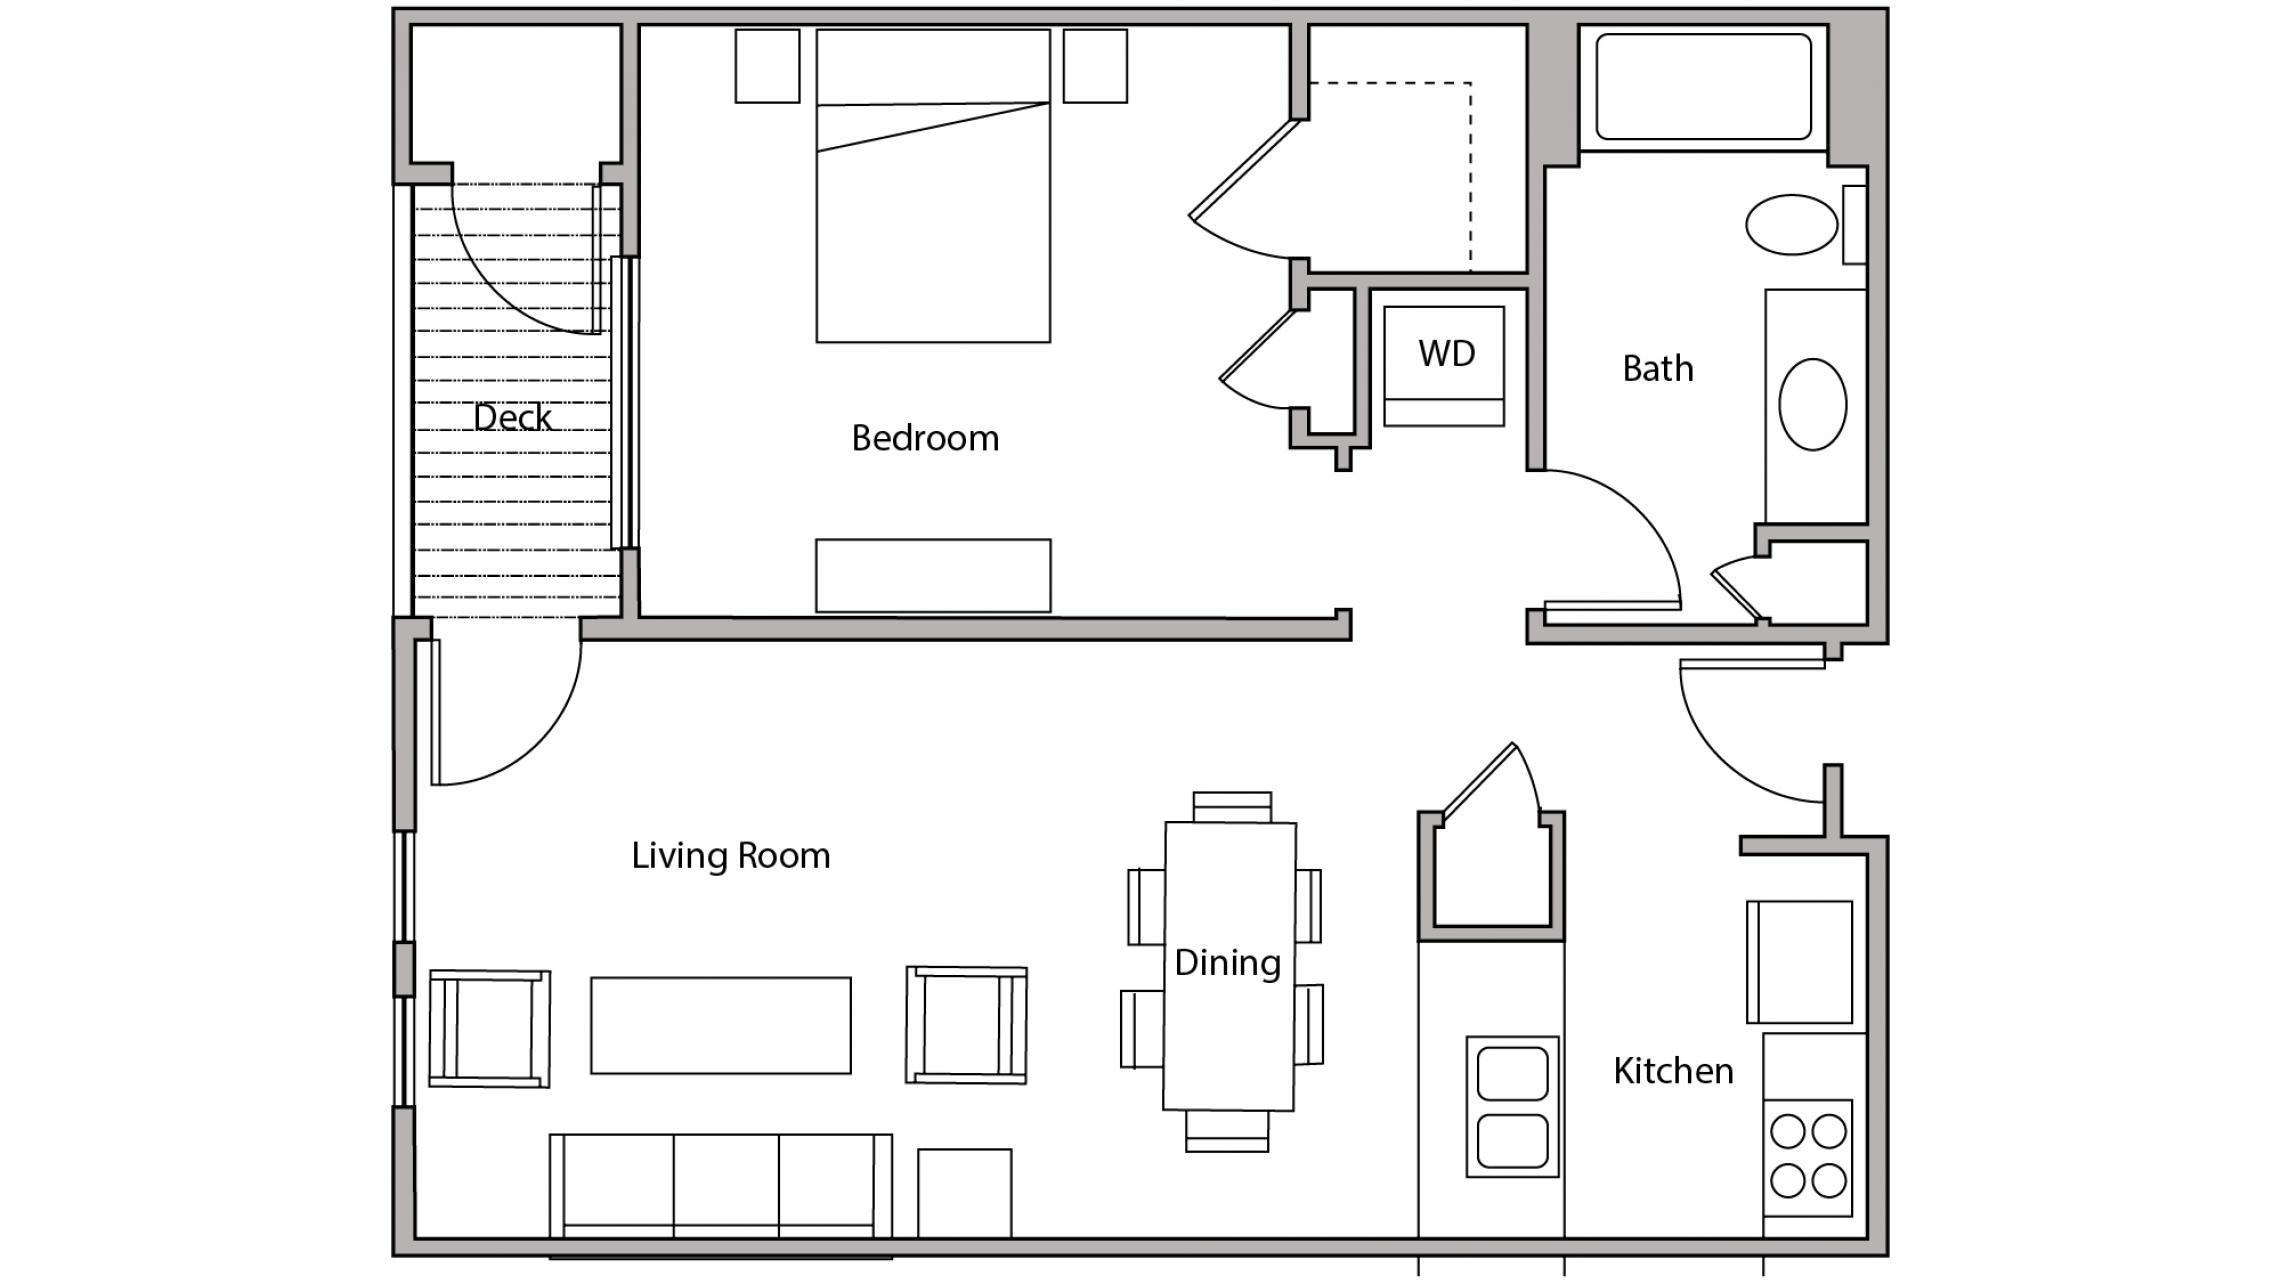 ULI City Place 405 - One Bedroom, One Bathroom